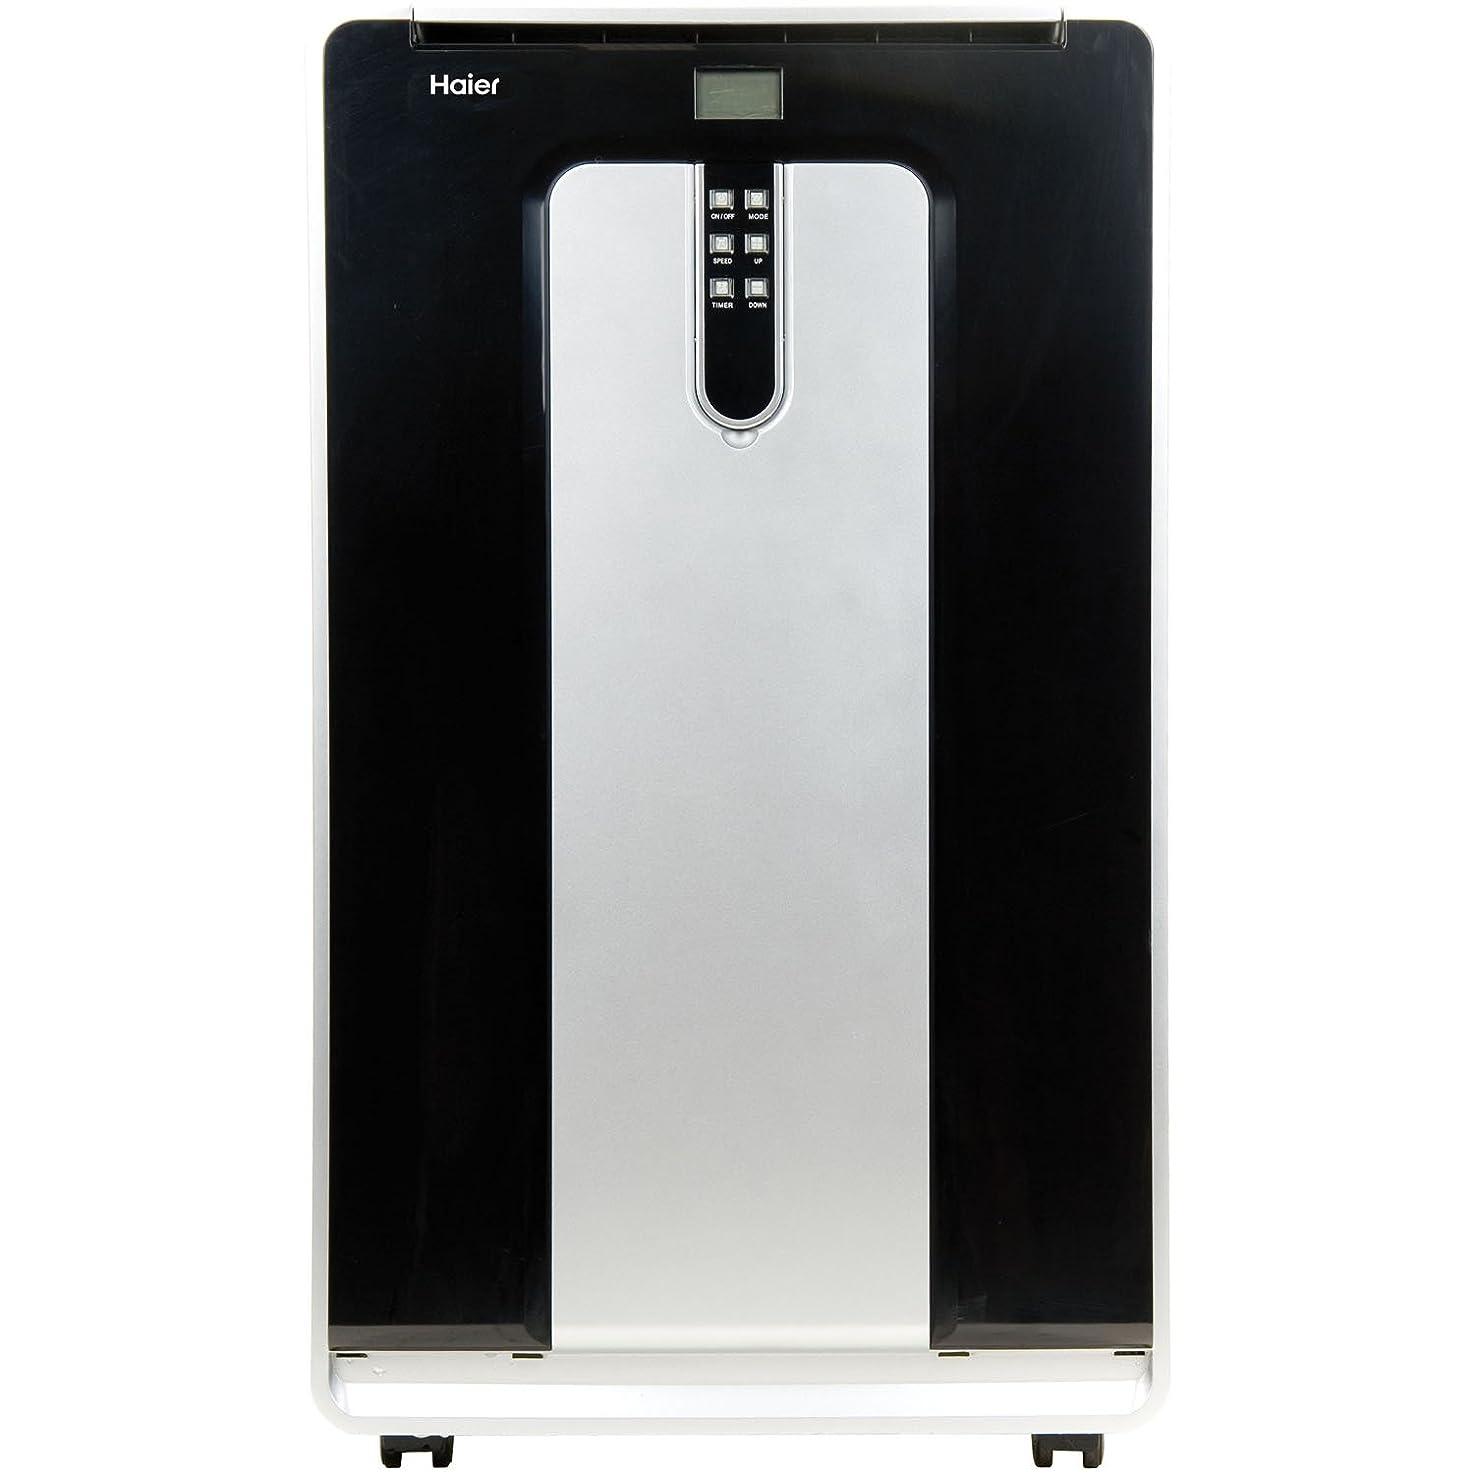 Haier 14000 14,000 BTU 115V Dual-Hose Portable hsstvyhtghsjf0